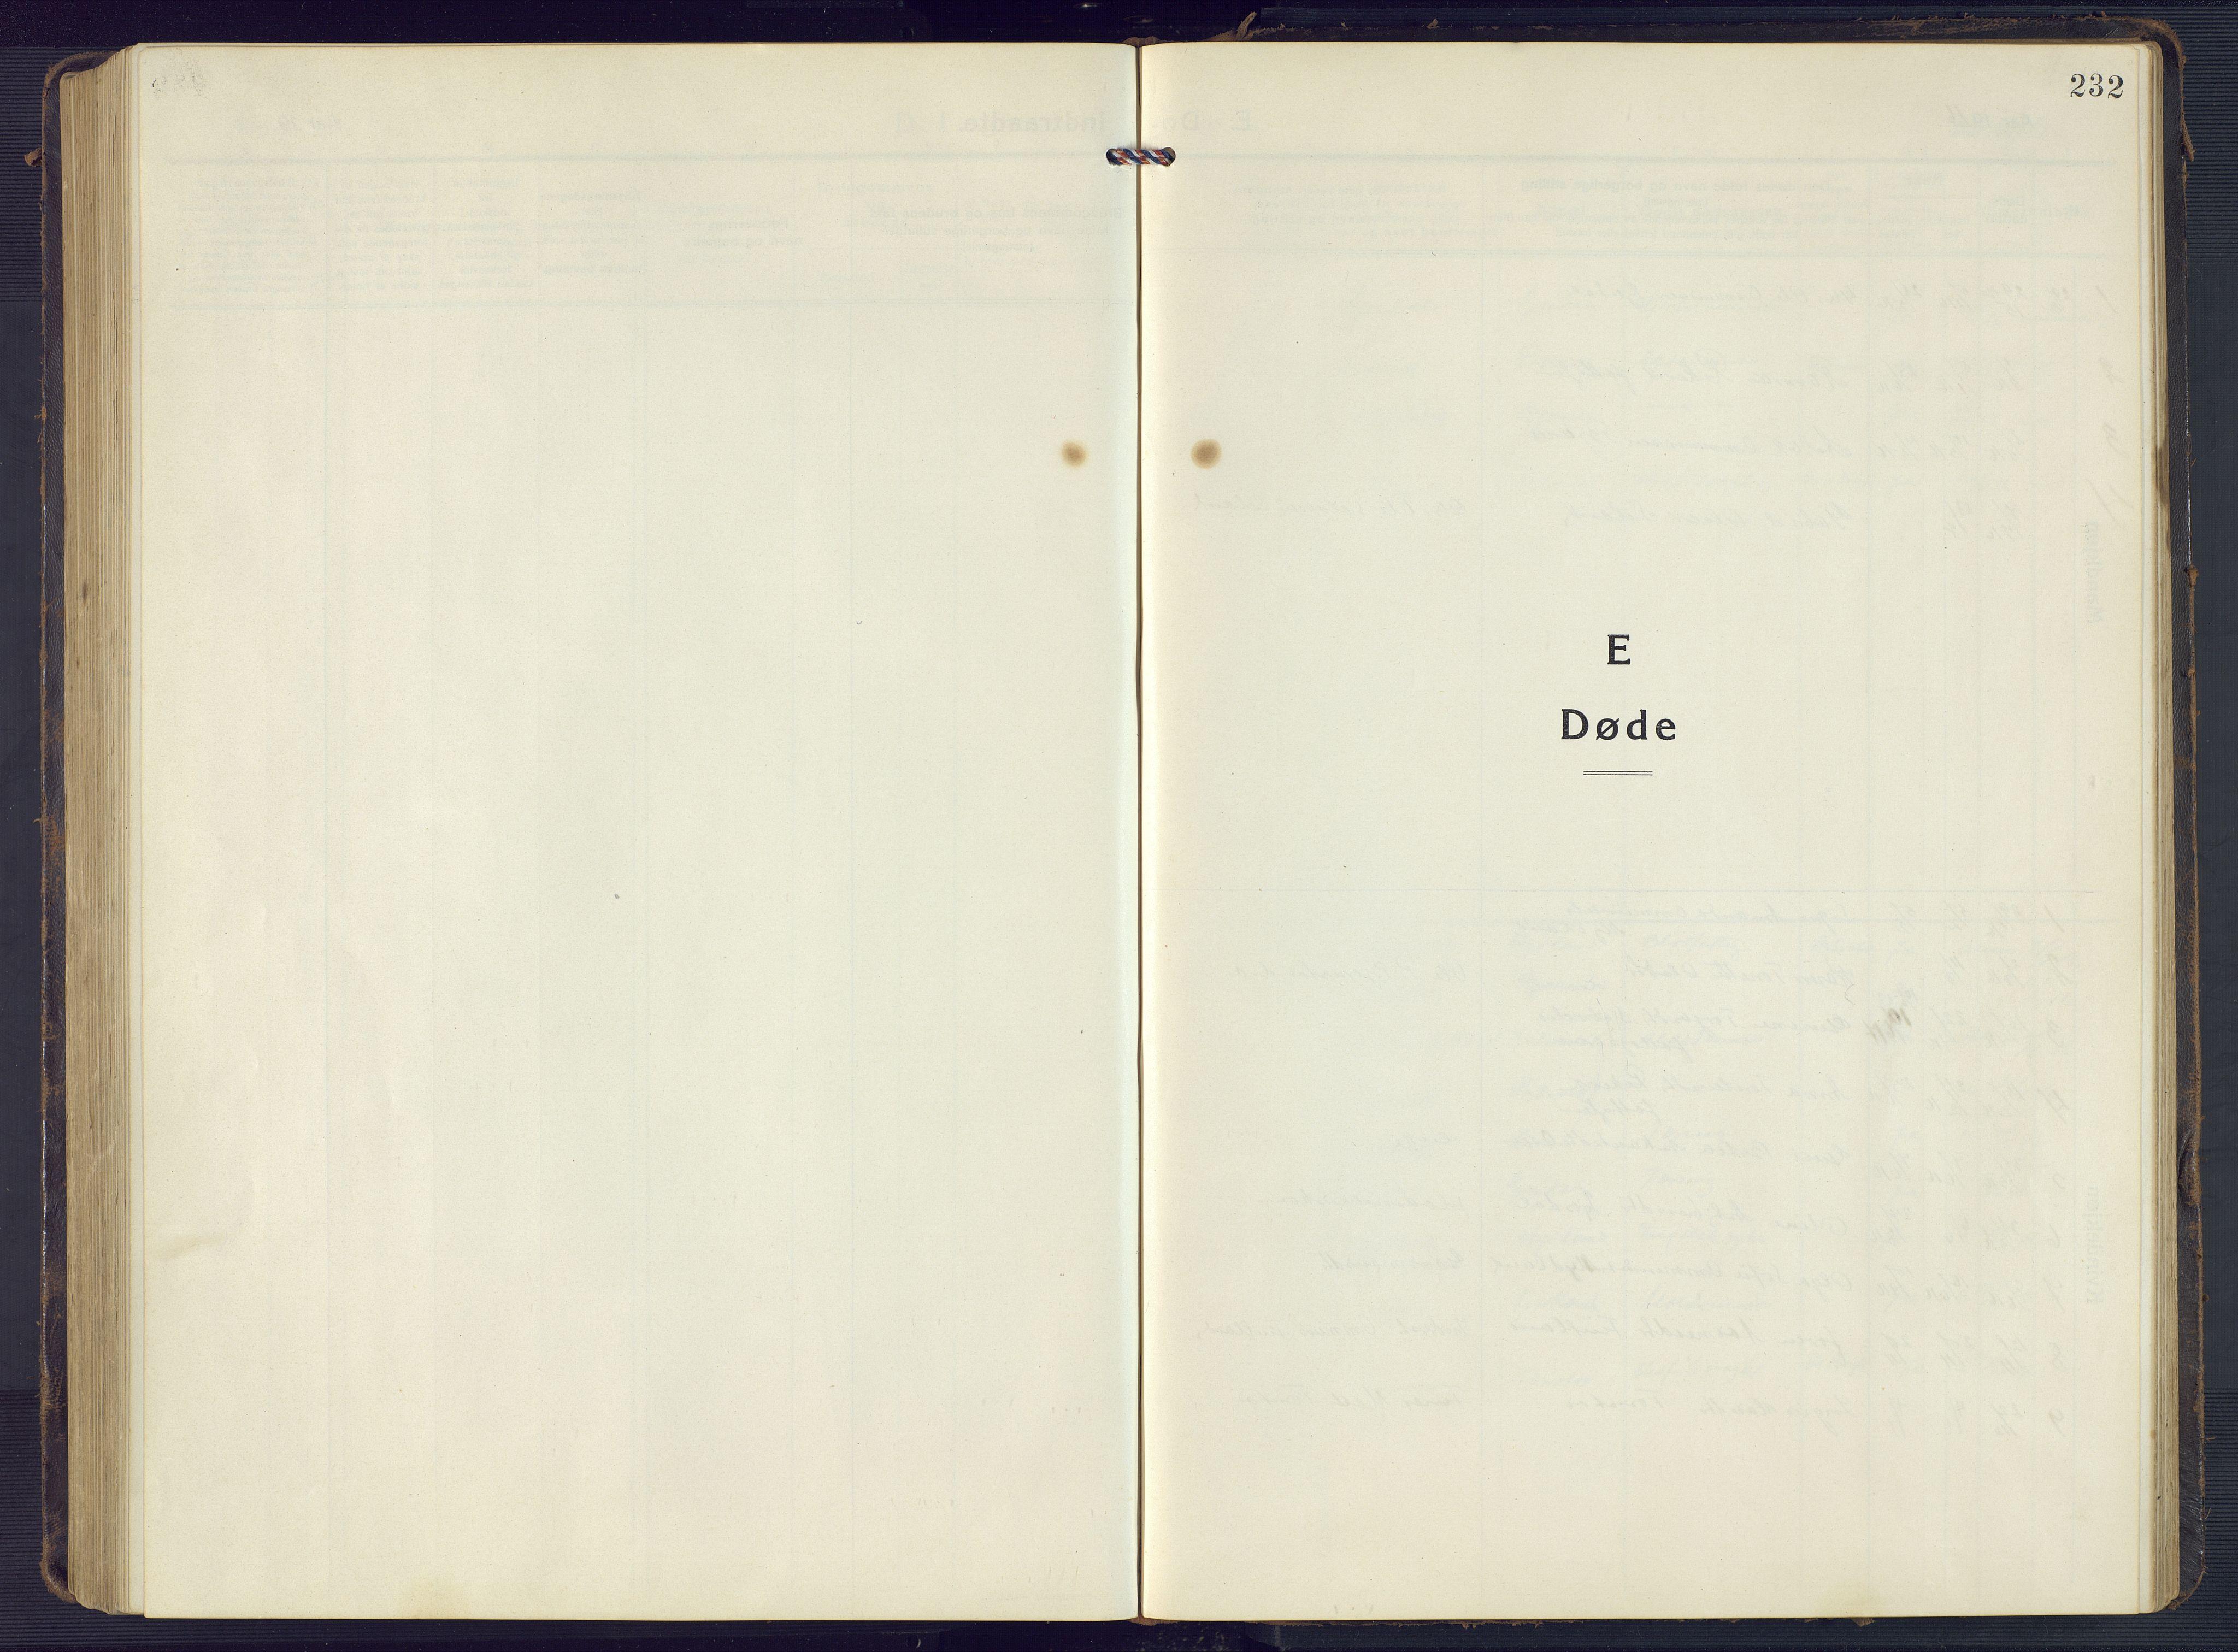 SAK, Sirdal sokneprestkontor, F/Fb/Fbb/L0005: Klokkerbok nr. B 5, 1916-1960, s. 232